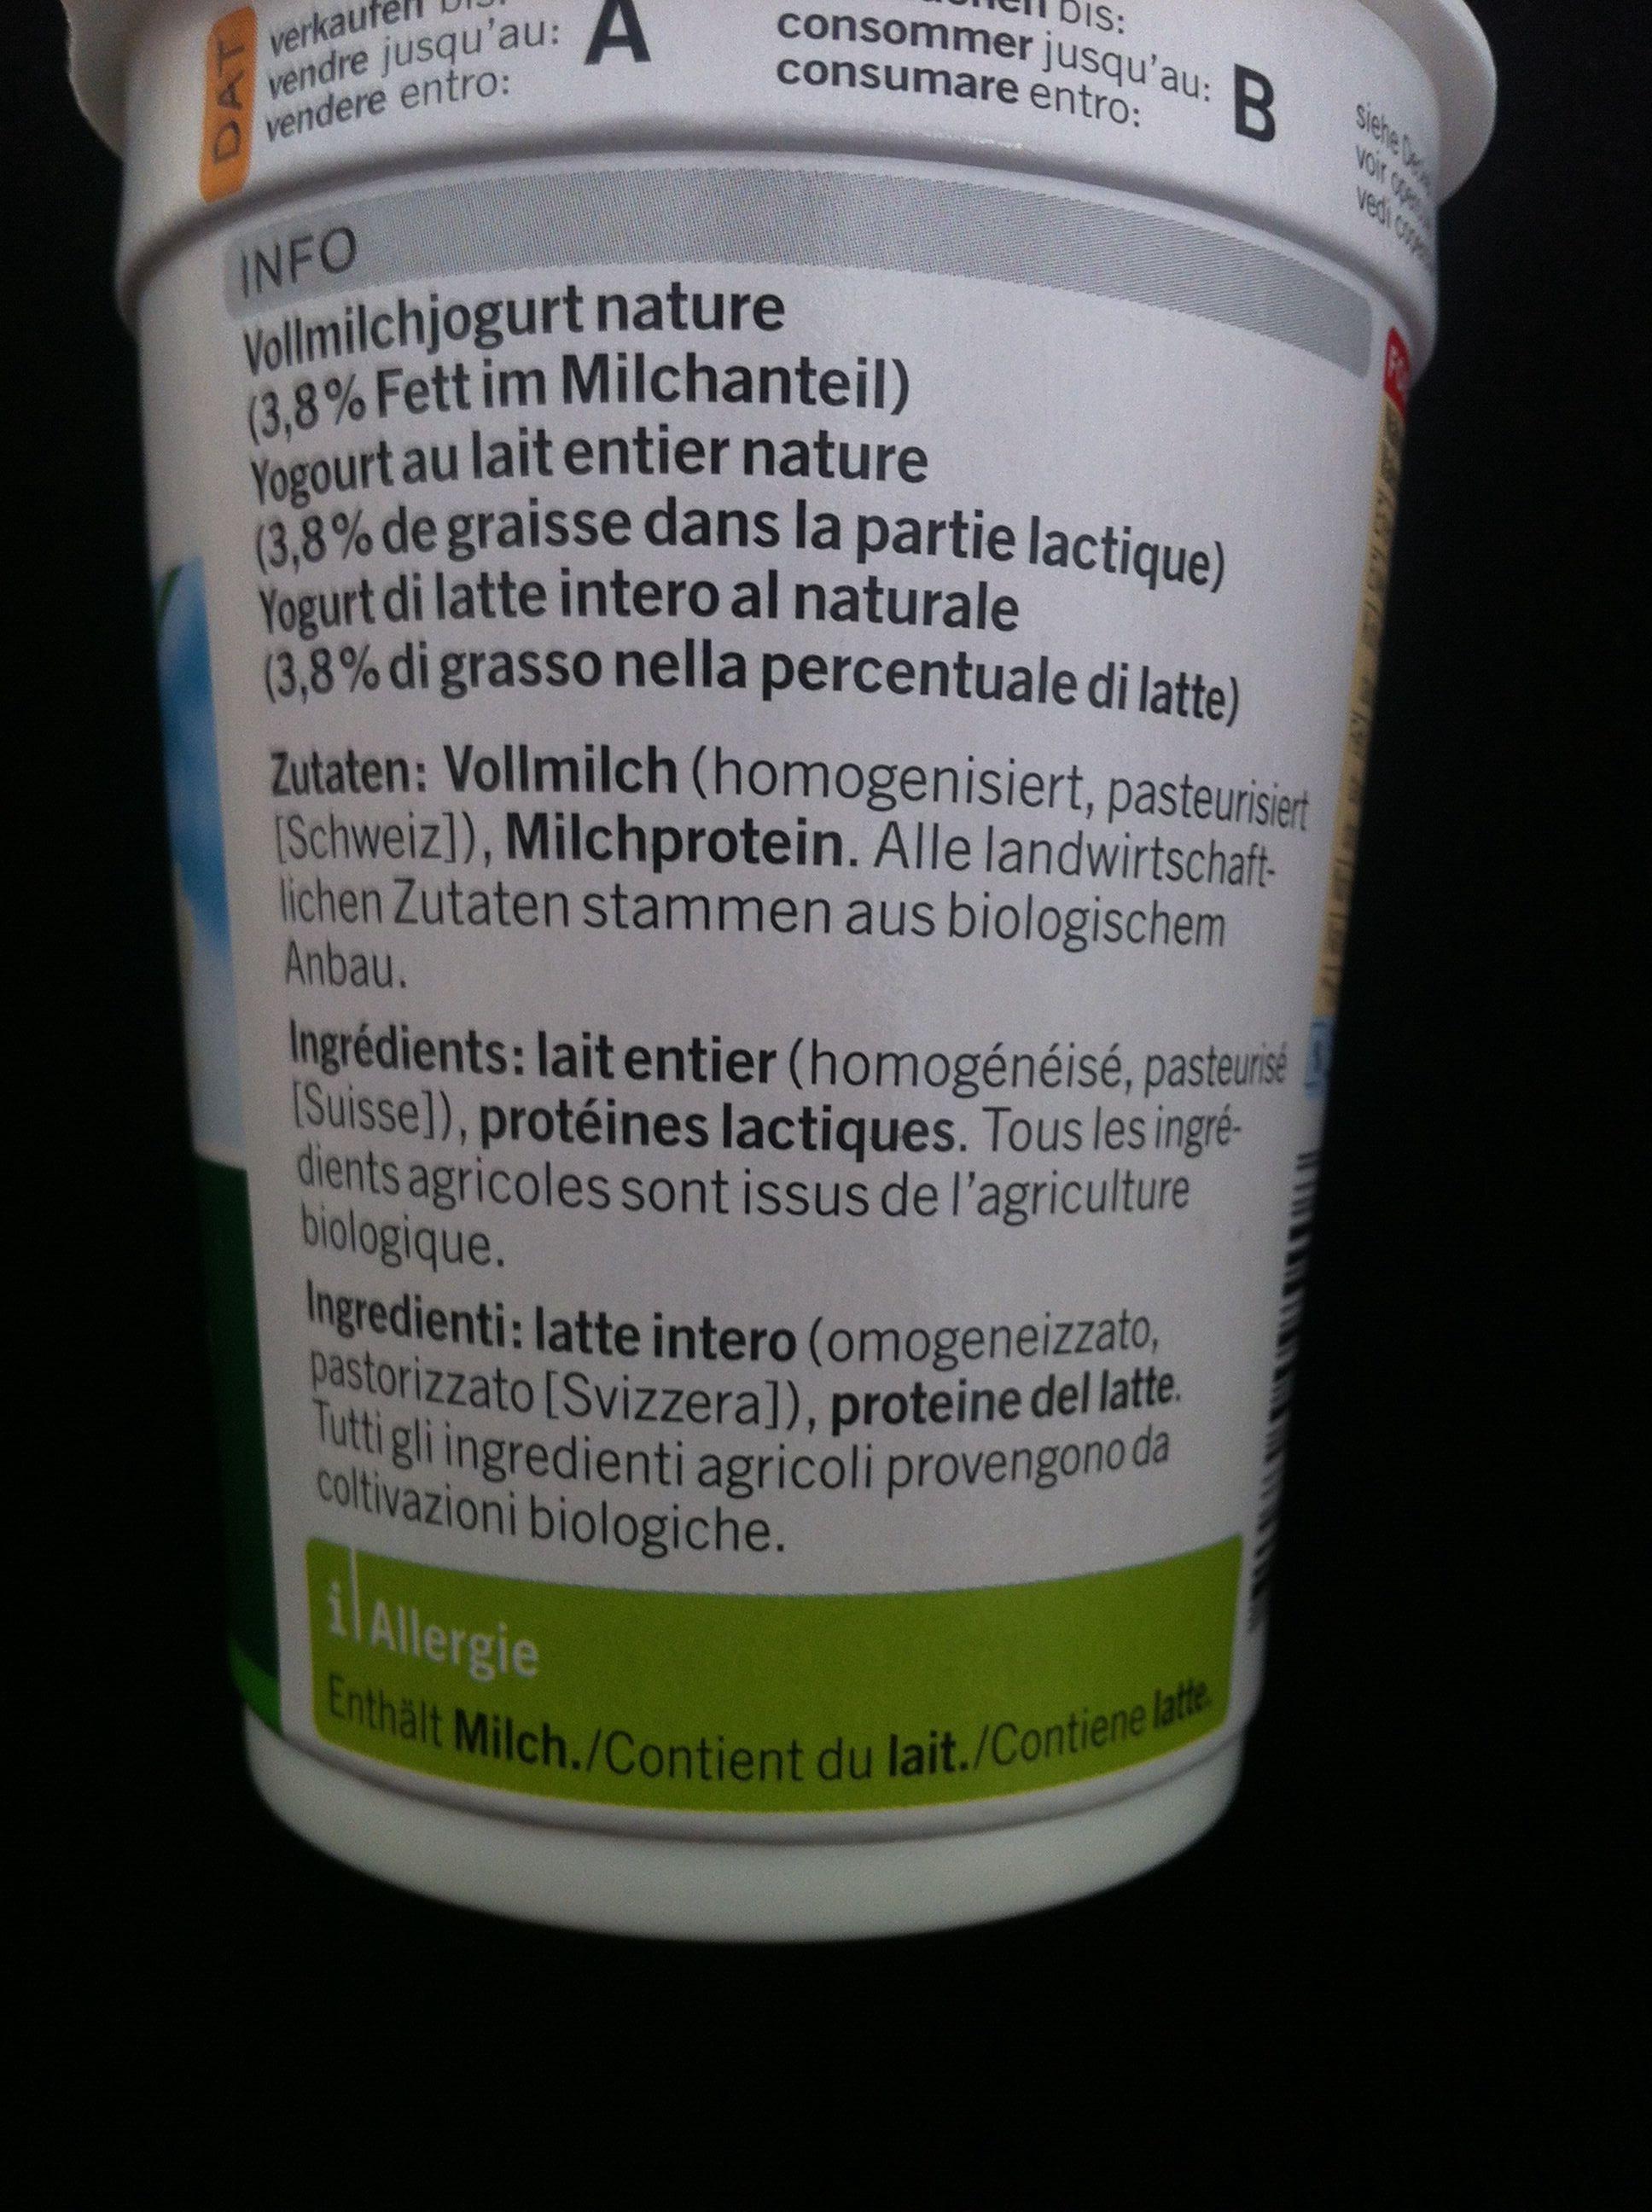 Jogurt al naturale - Ingrediënten